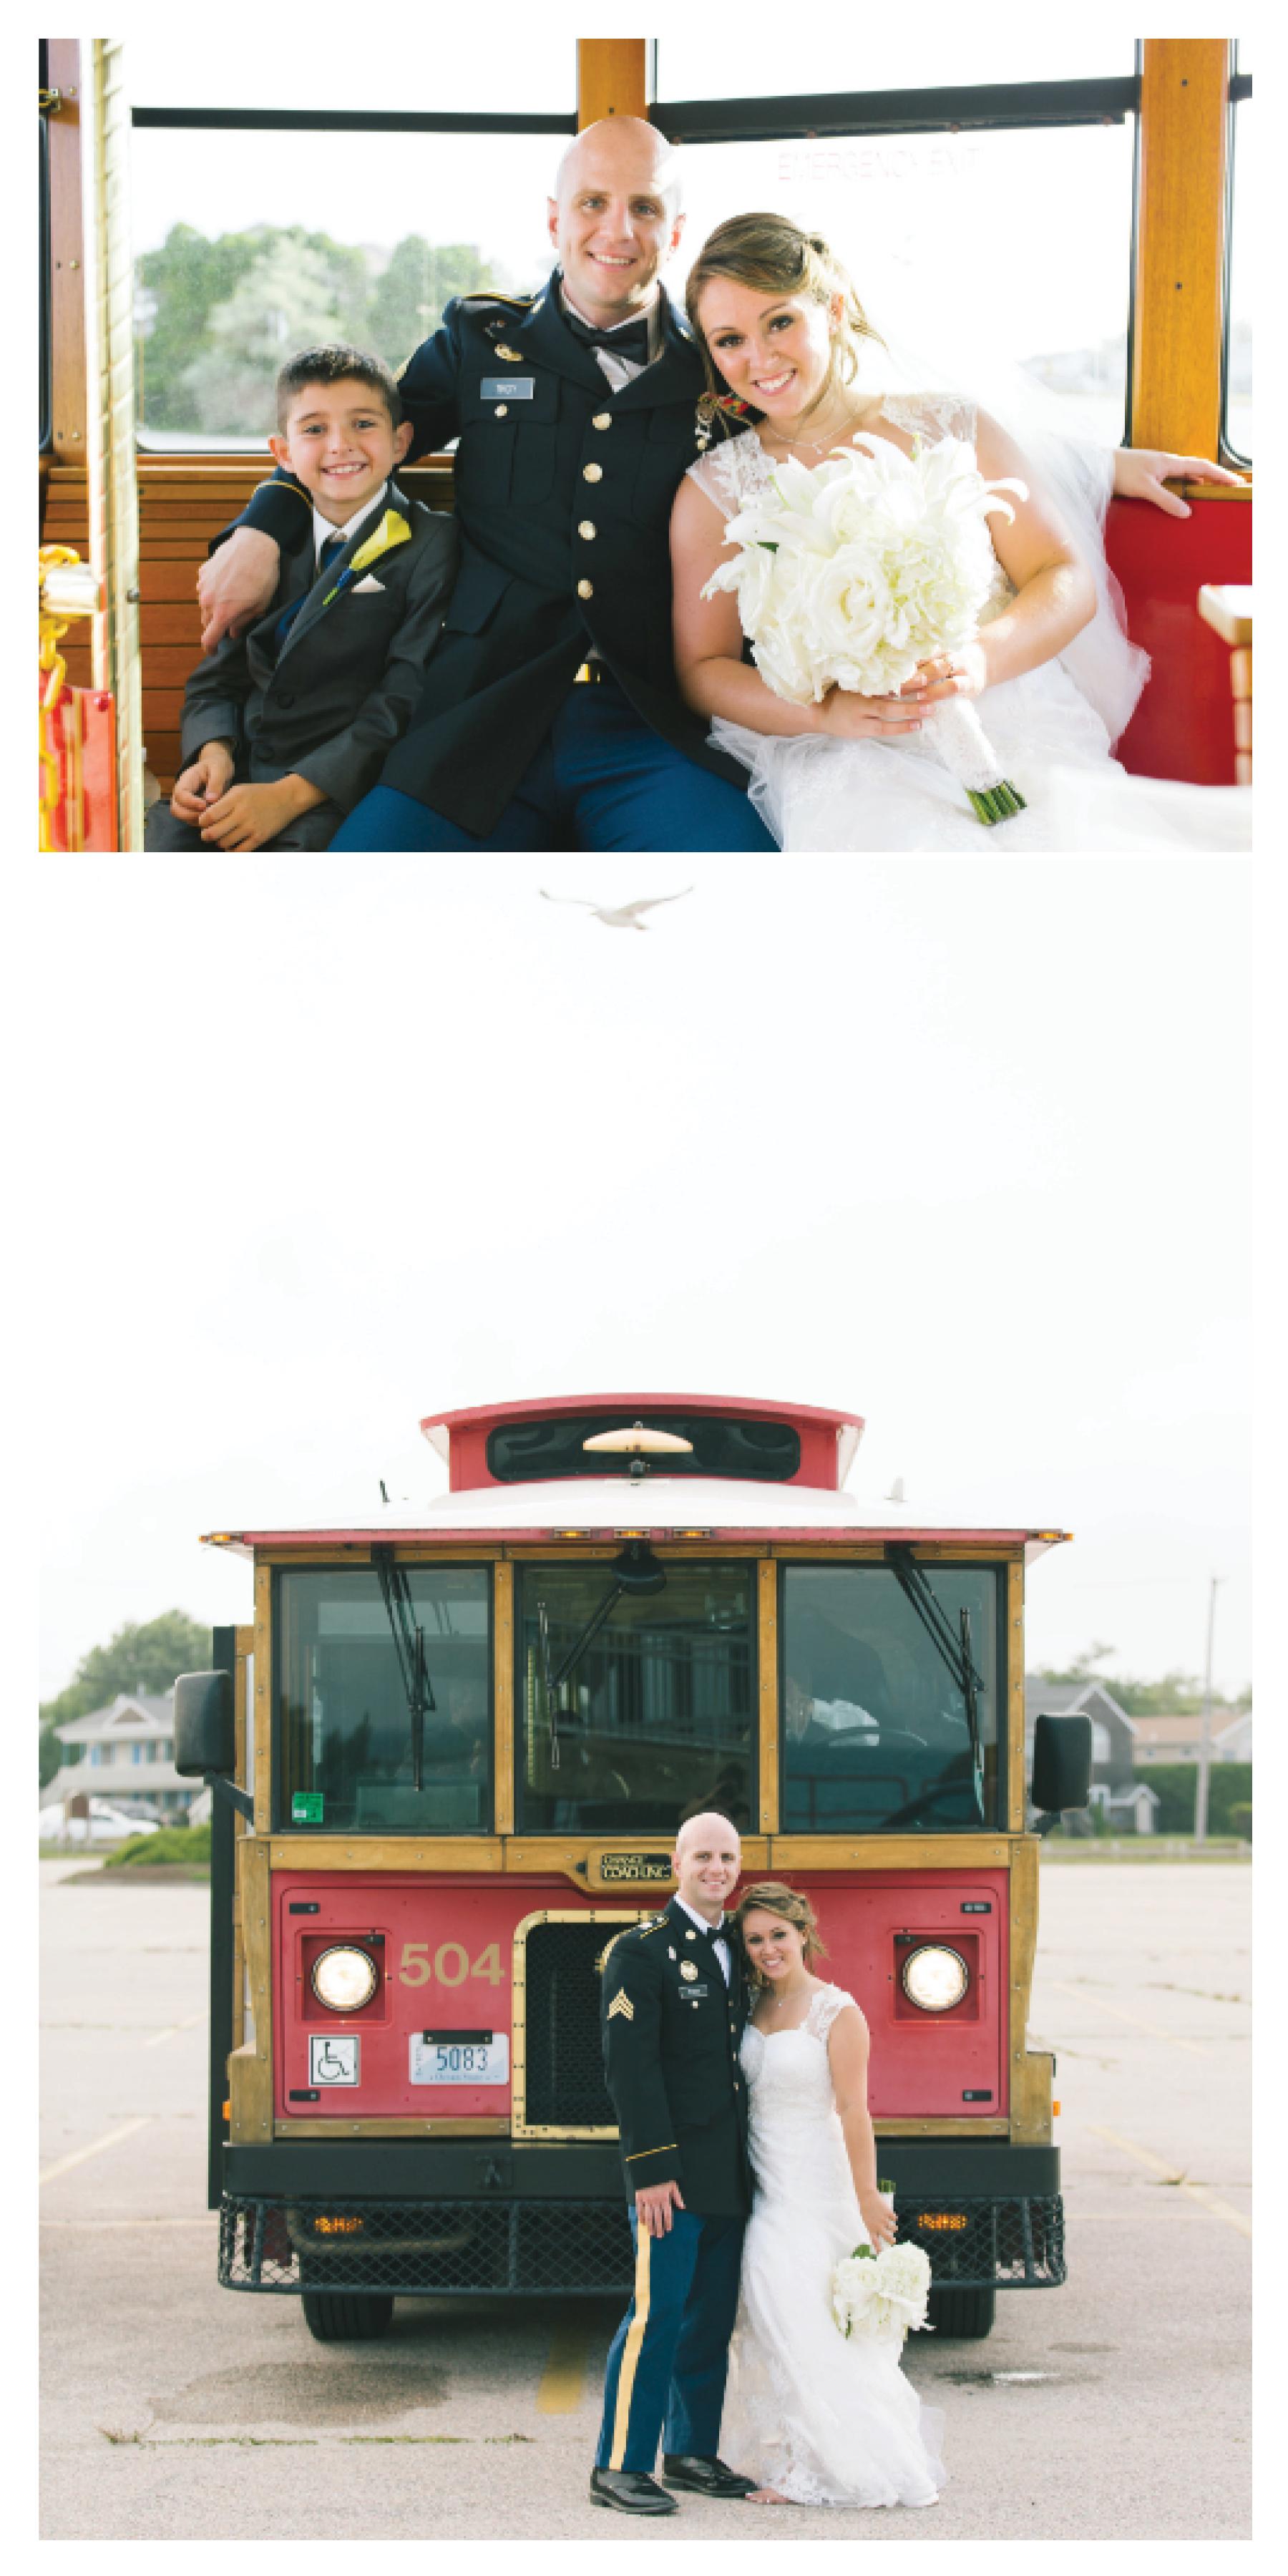 tracyrodriguezphotography-borrowedandblue-erin-brian4.jpg